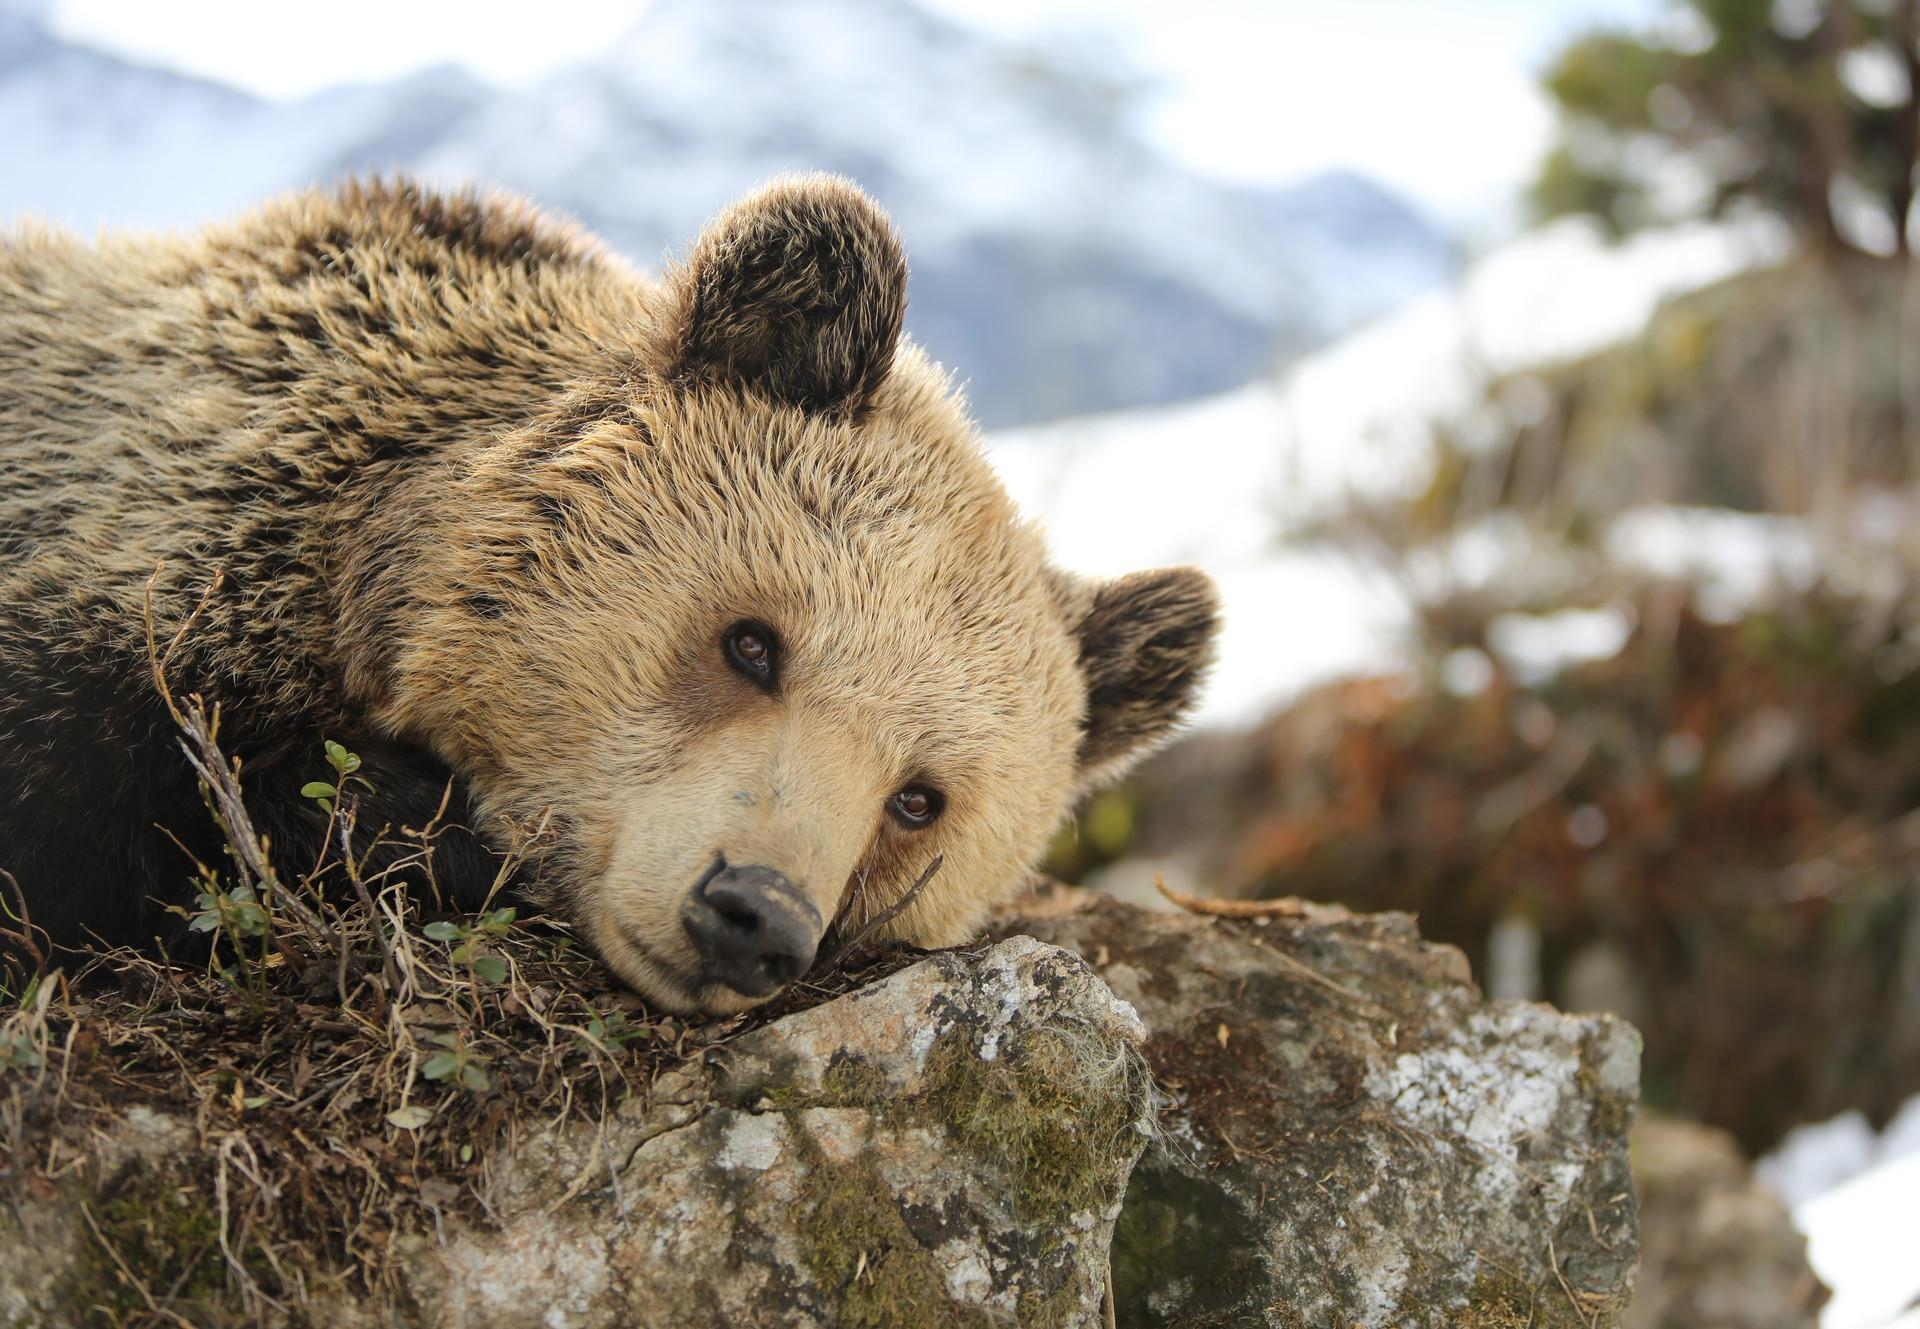 Bear Amelia at Arosa Bear Sanctuary